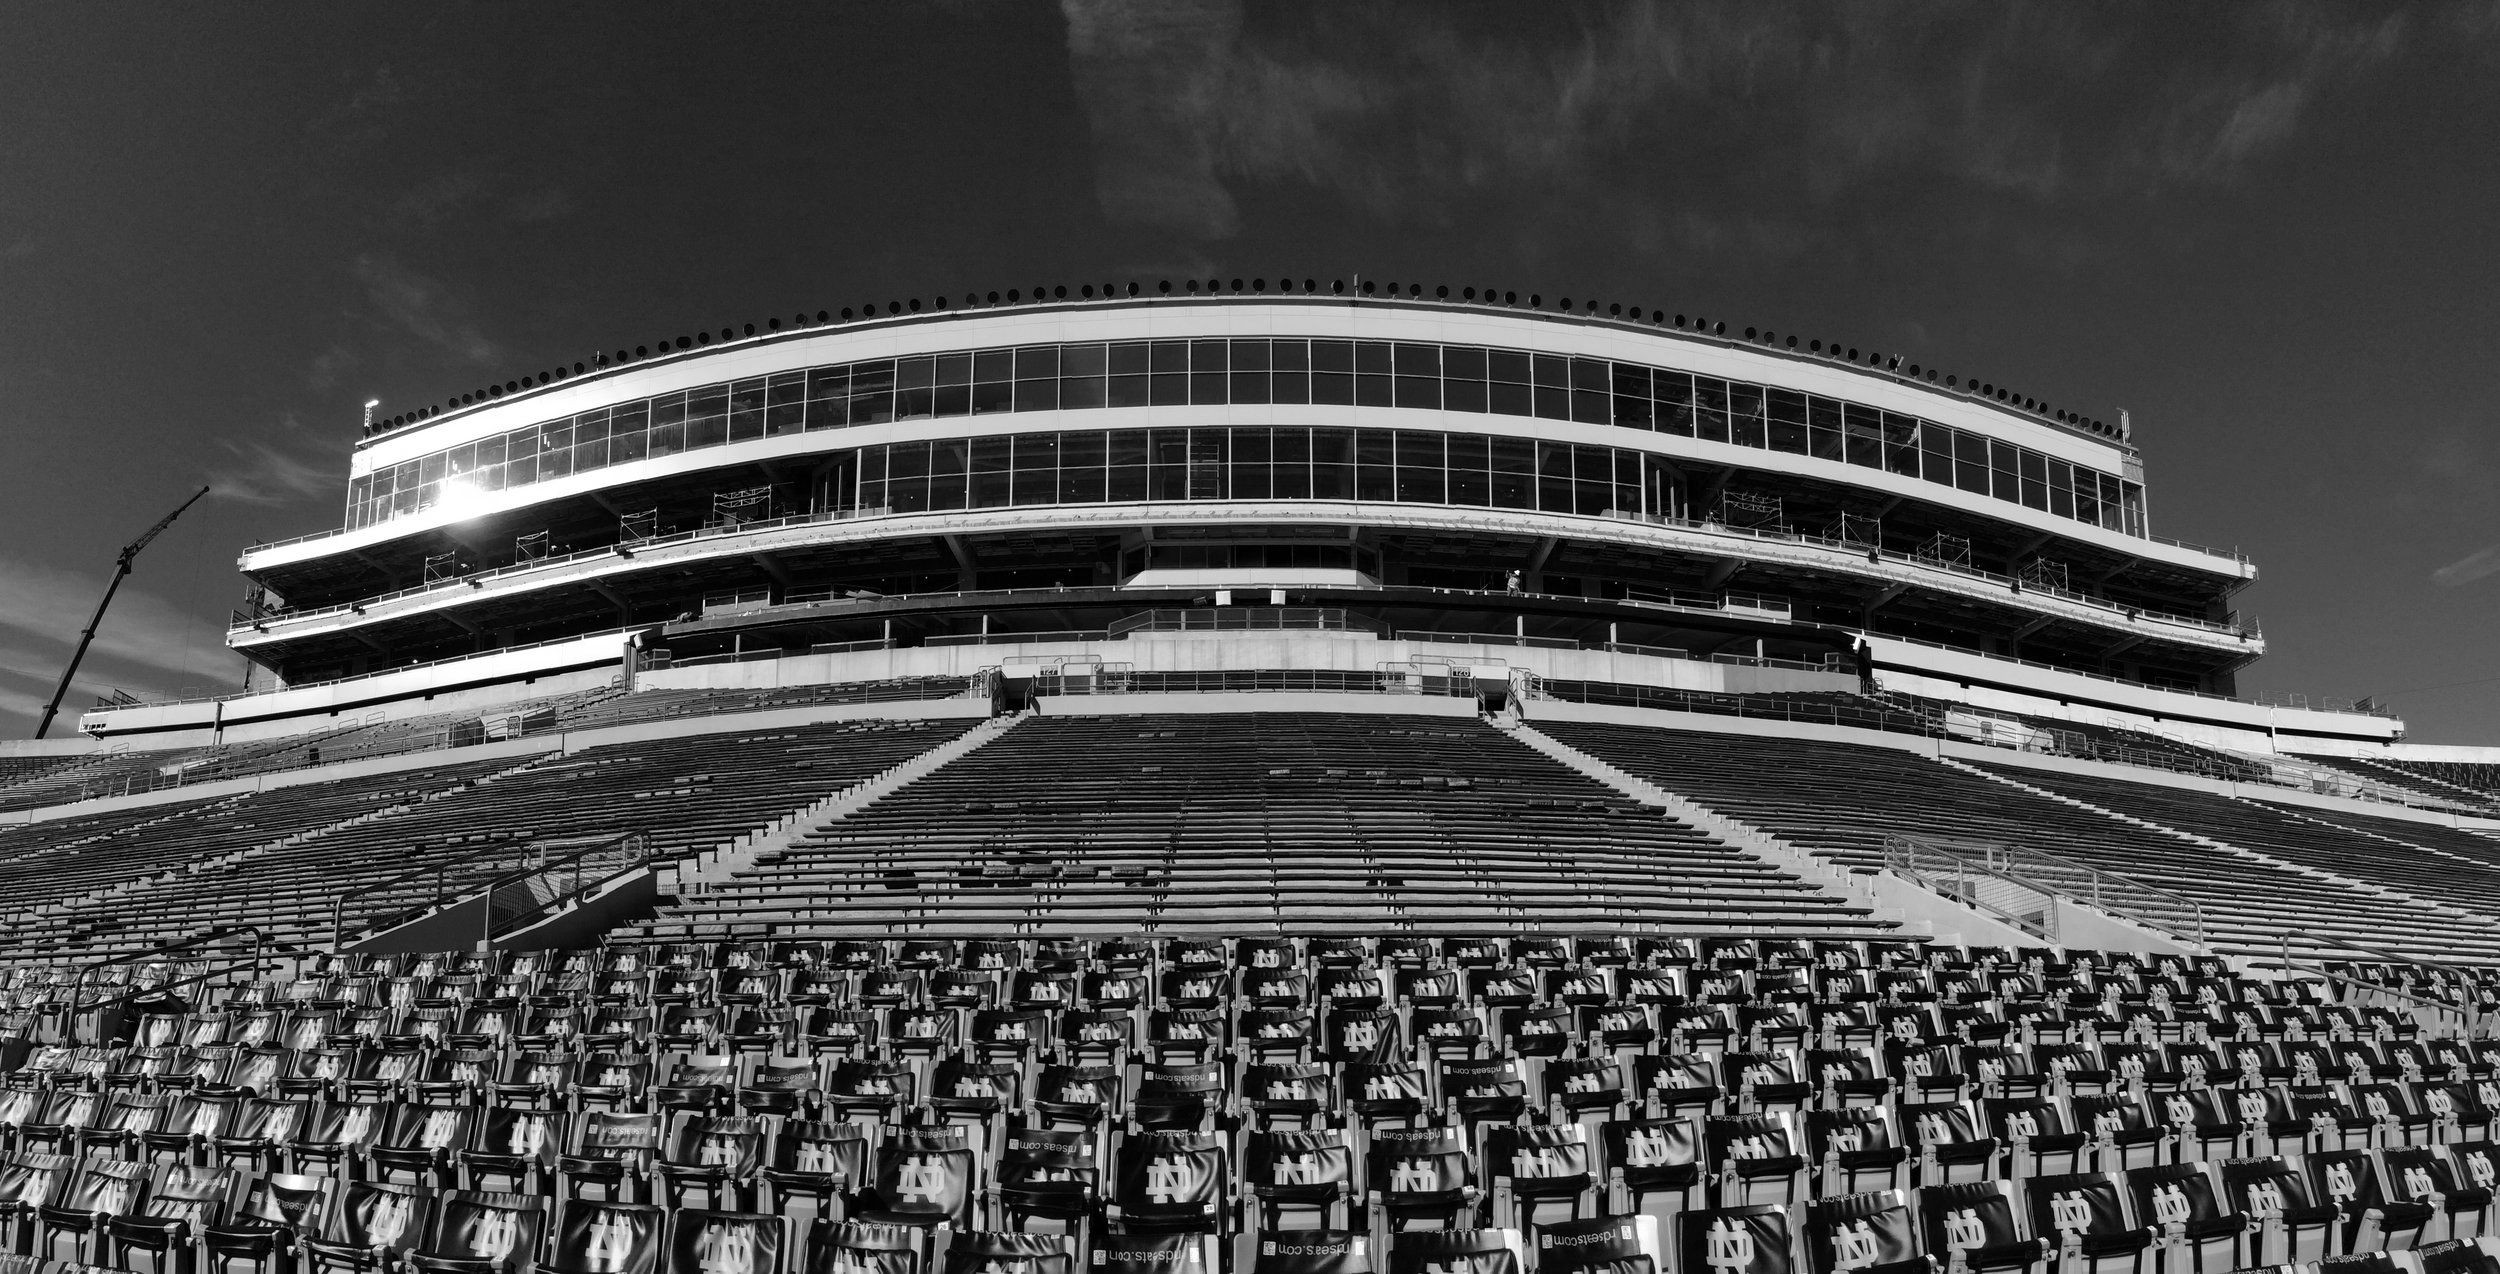 Notre Dame Stadium South Bend, Ia 2.JPG